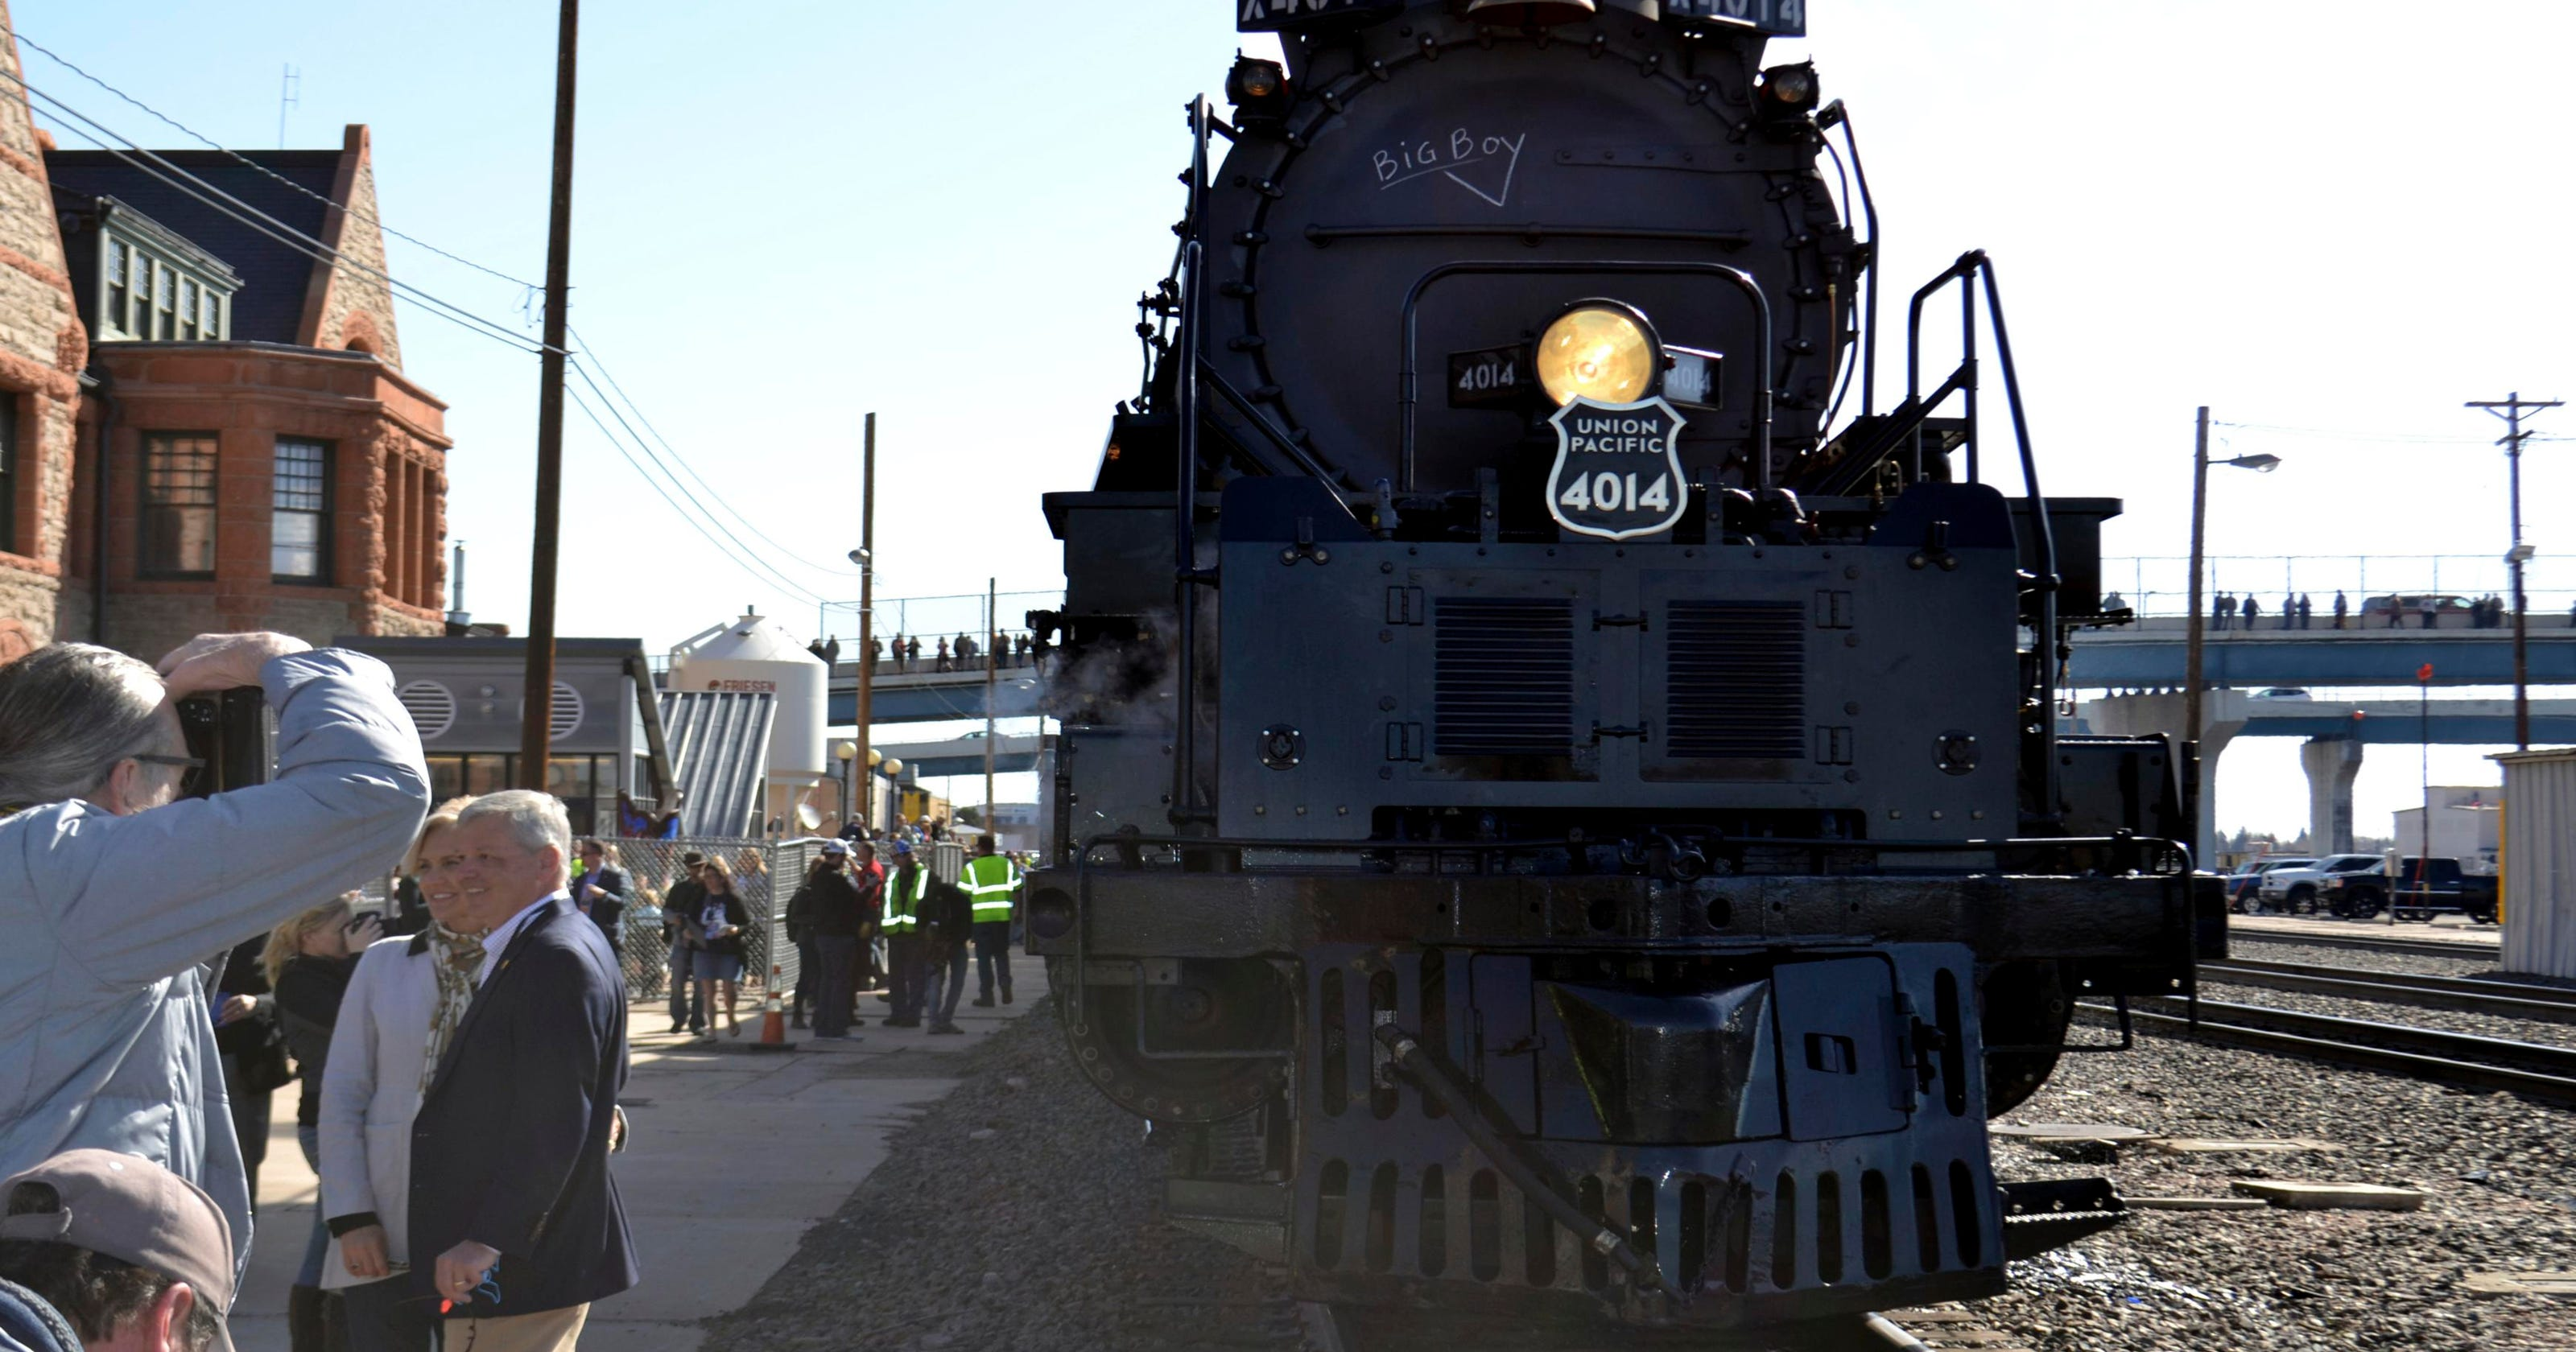 Union Pacific 'Big Boy' Locomotive Refurbished